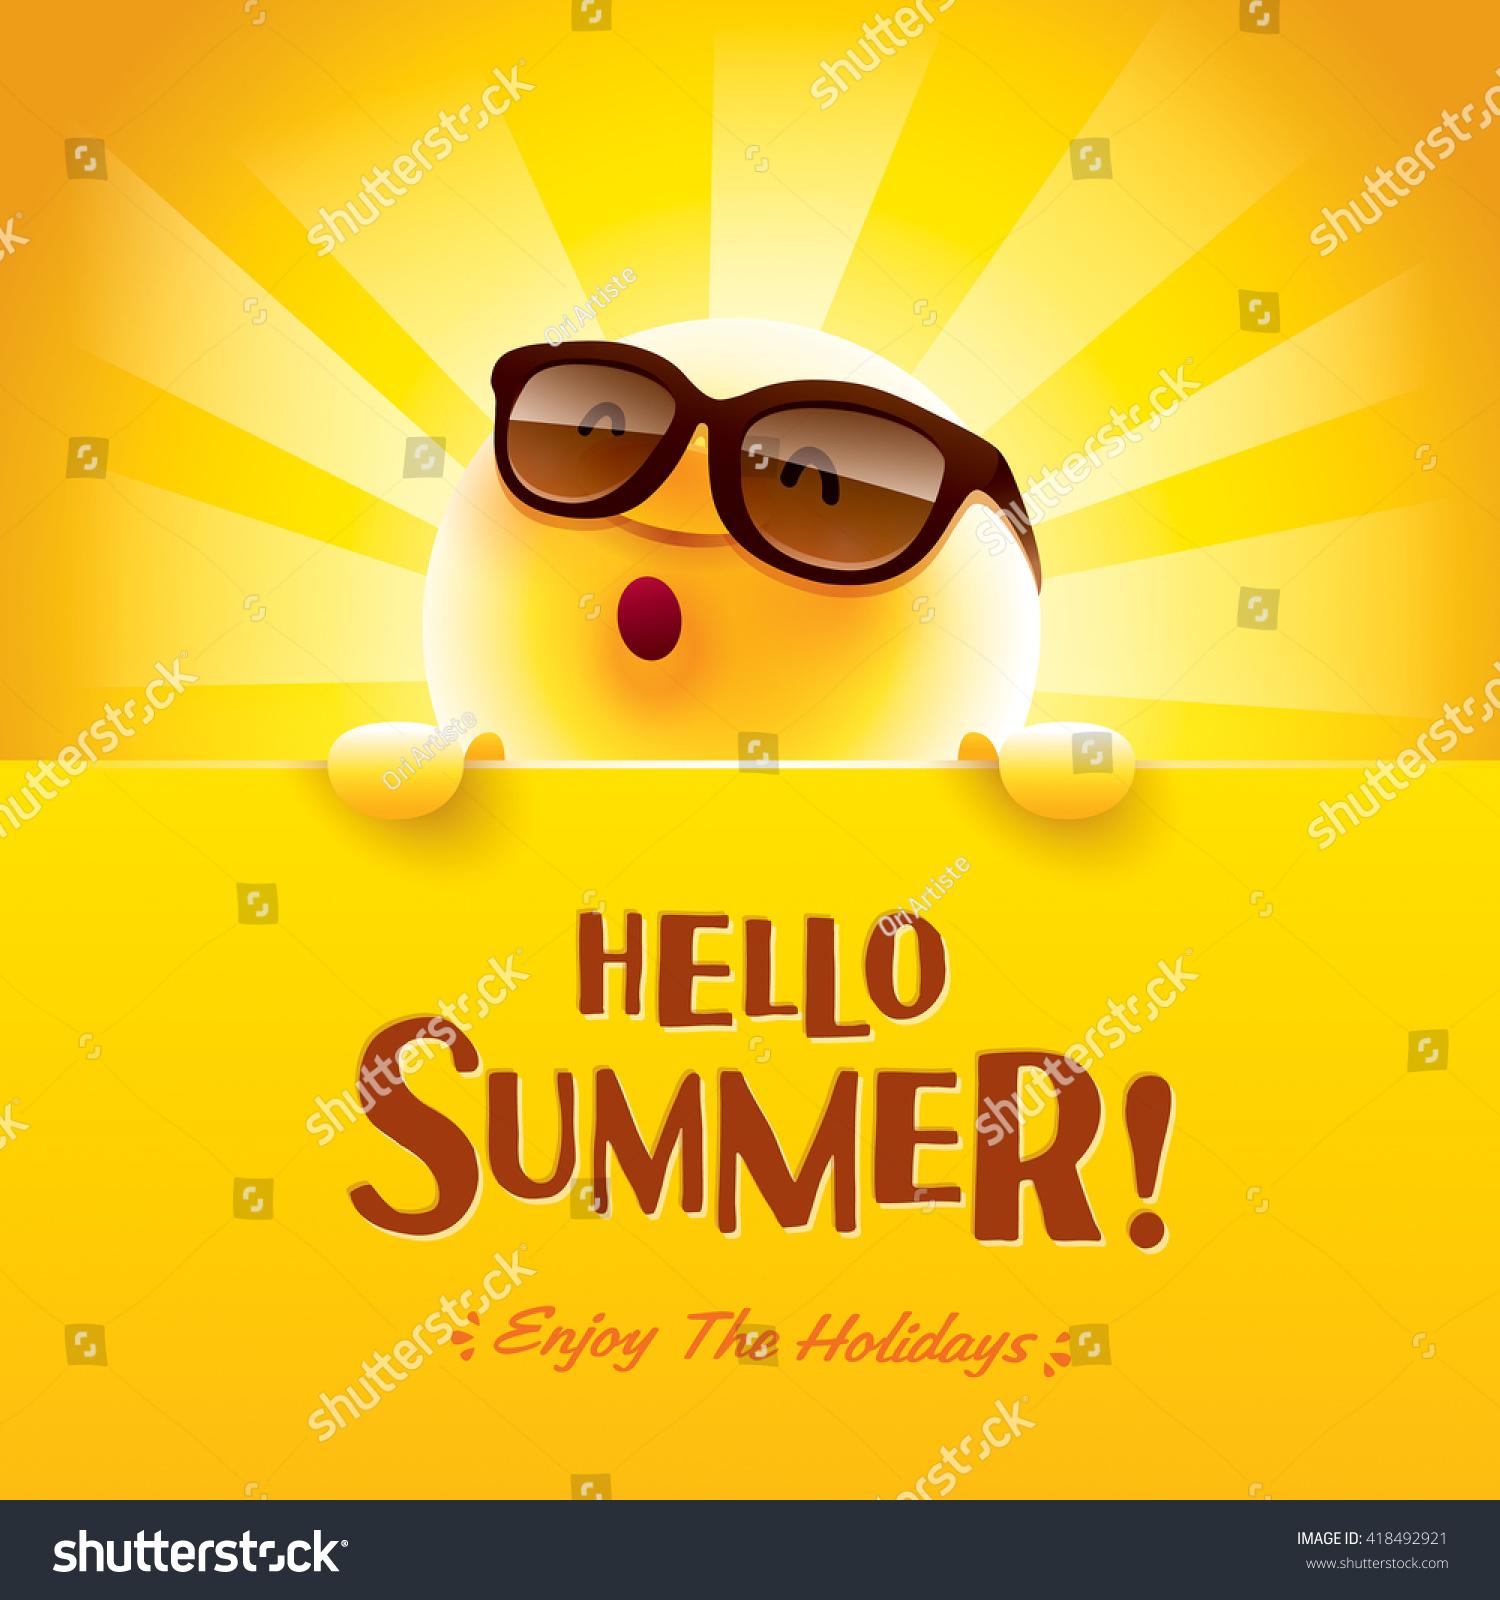 Couple Enjoying Their Summer Holidays Stock Photo: Hello Summer Enjoy Holidays Stock Vector 418492921